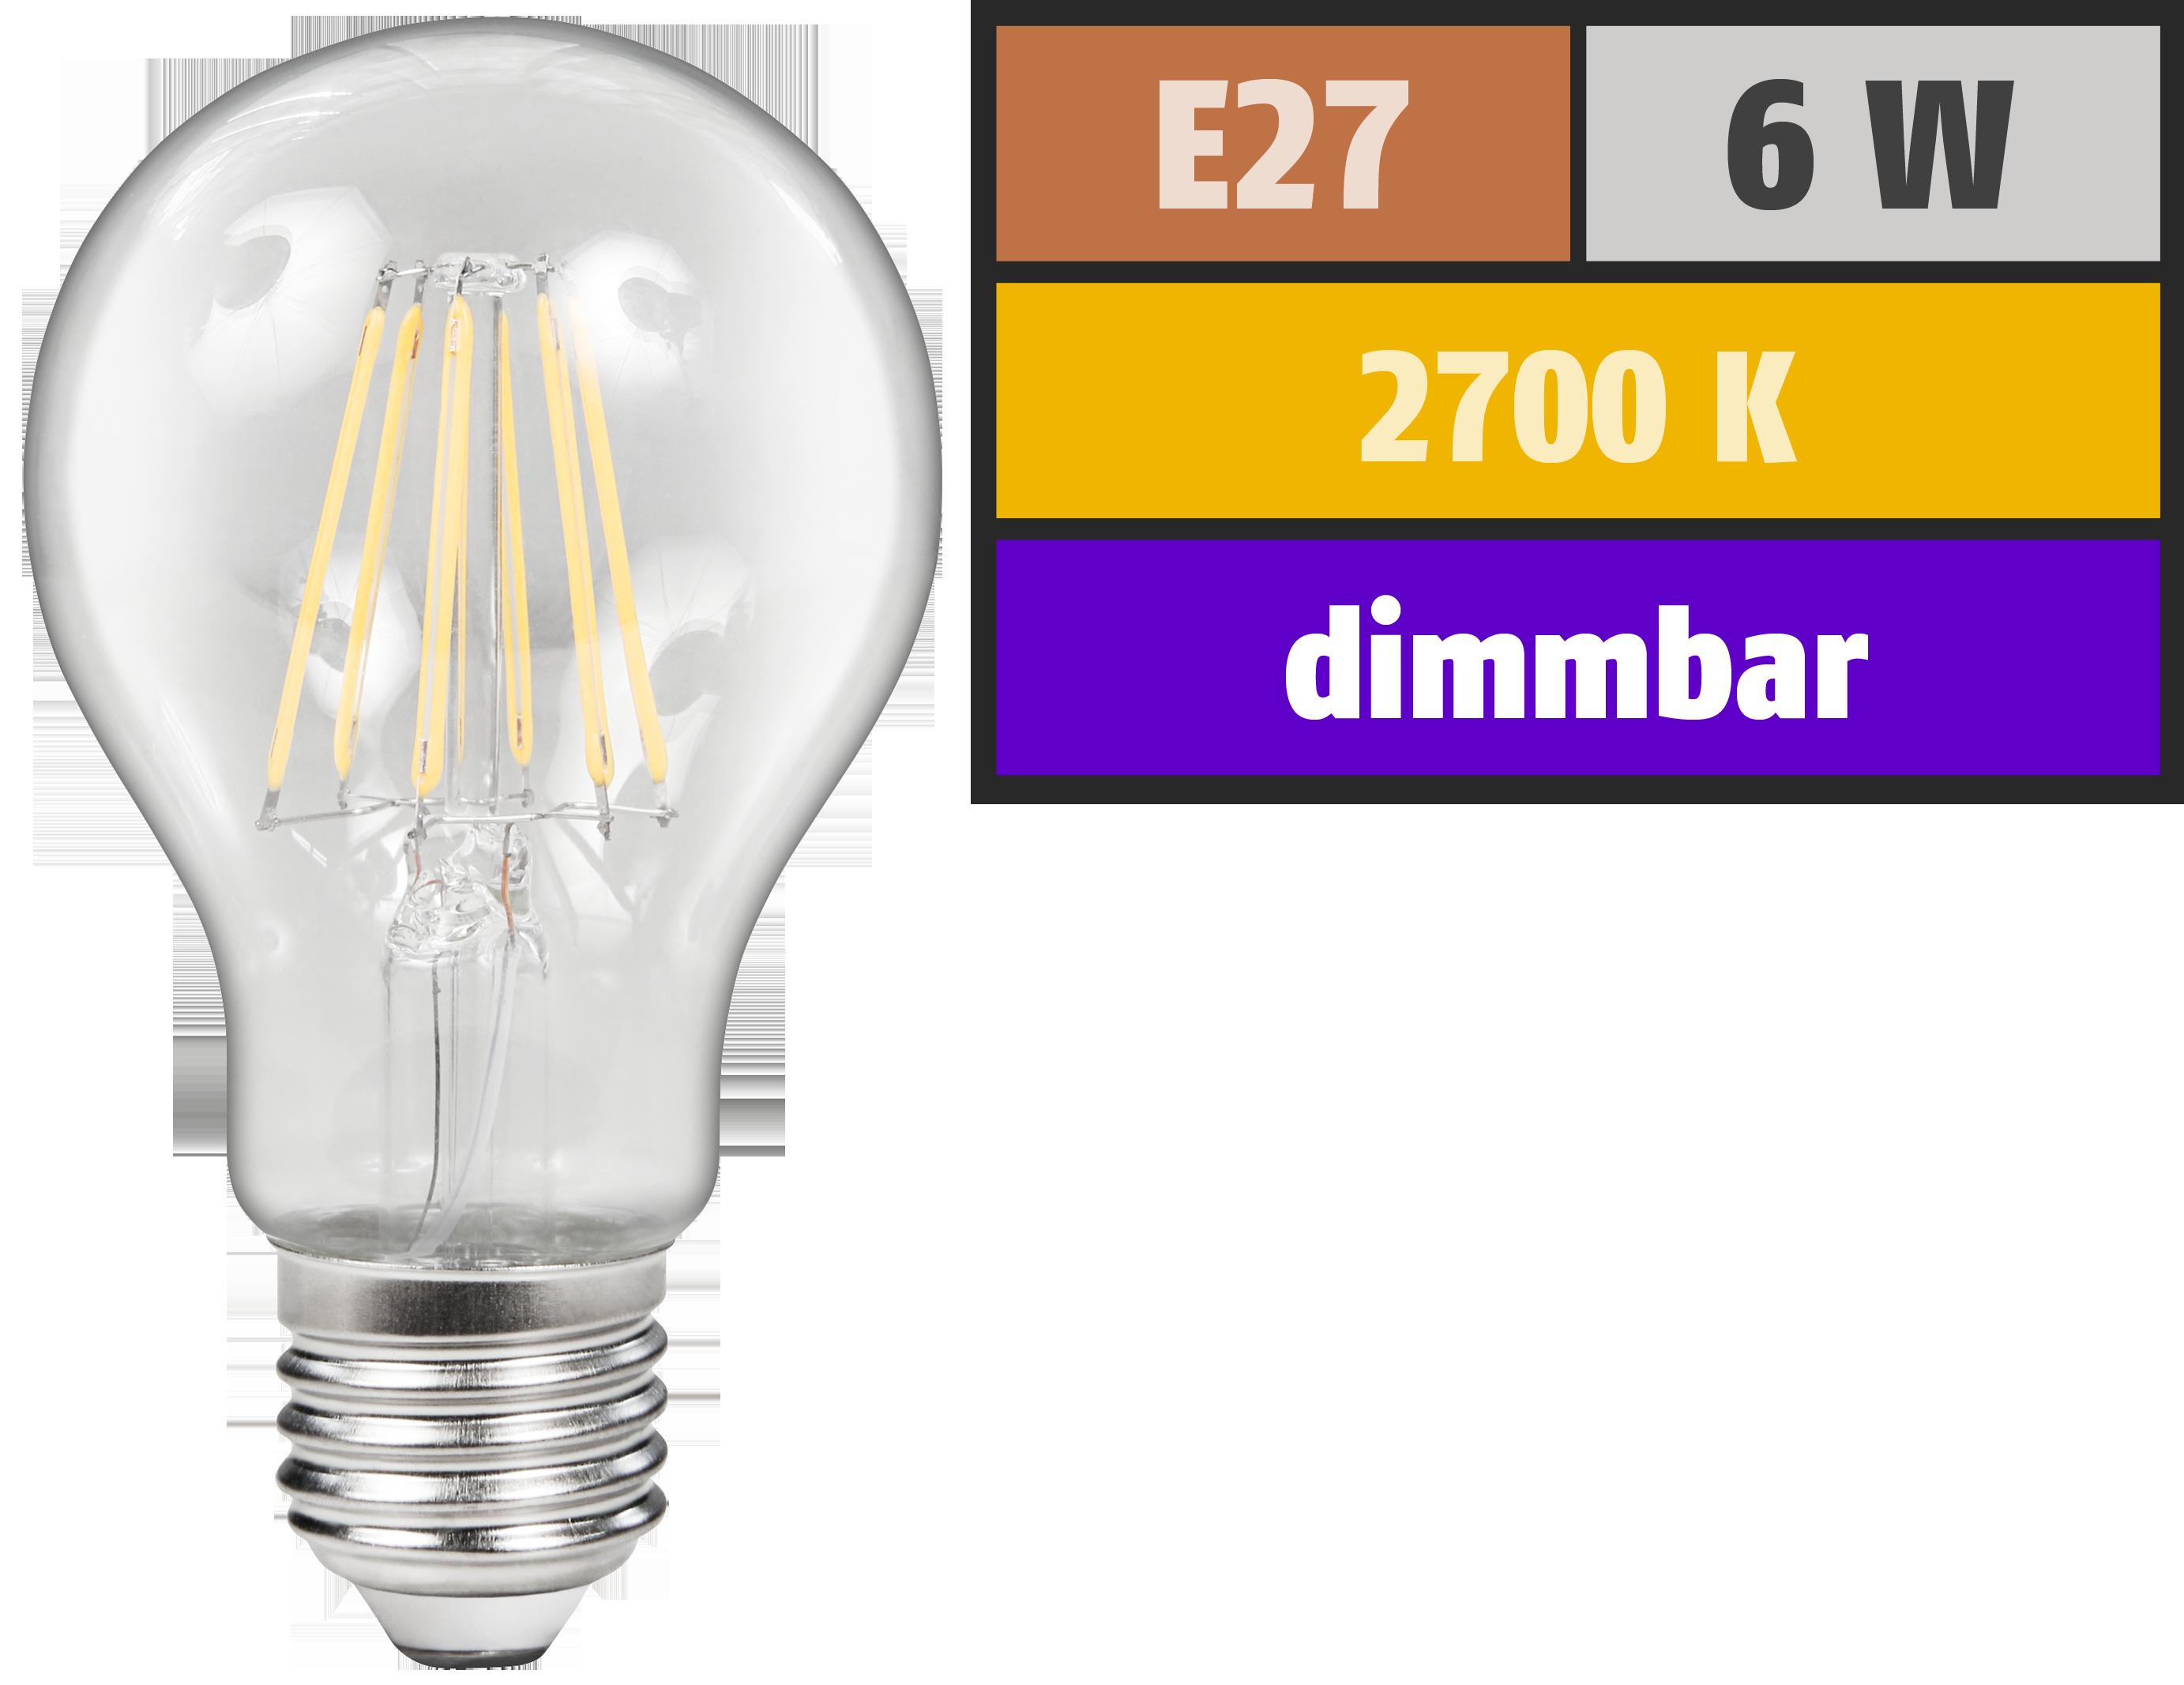 LED Filament Glühlampe McShine ''Filed'', E27, 6W, 600 lm, warmweiß, dimmbar, klar